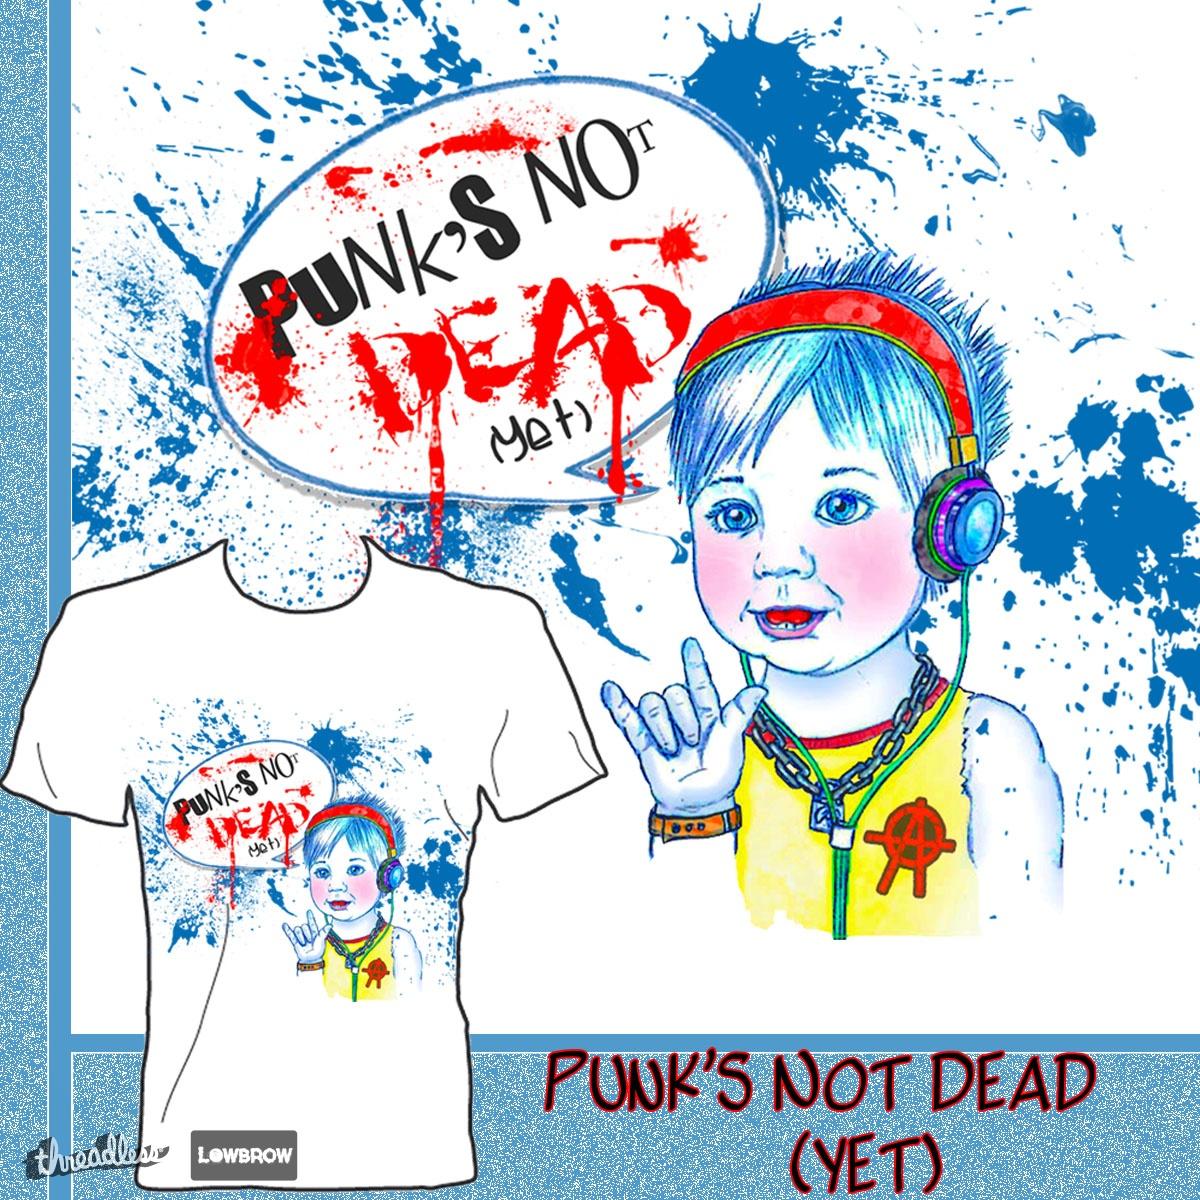 PUNK'S NOT DEAD (yet) by cutiepiegiggles on Threadless